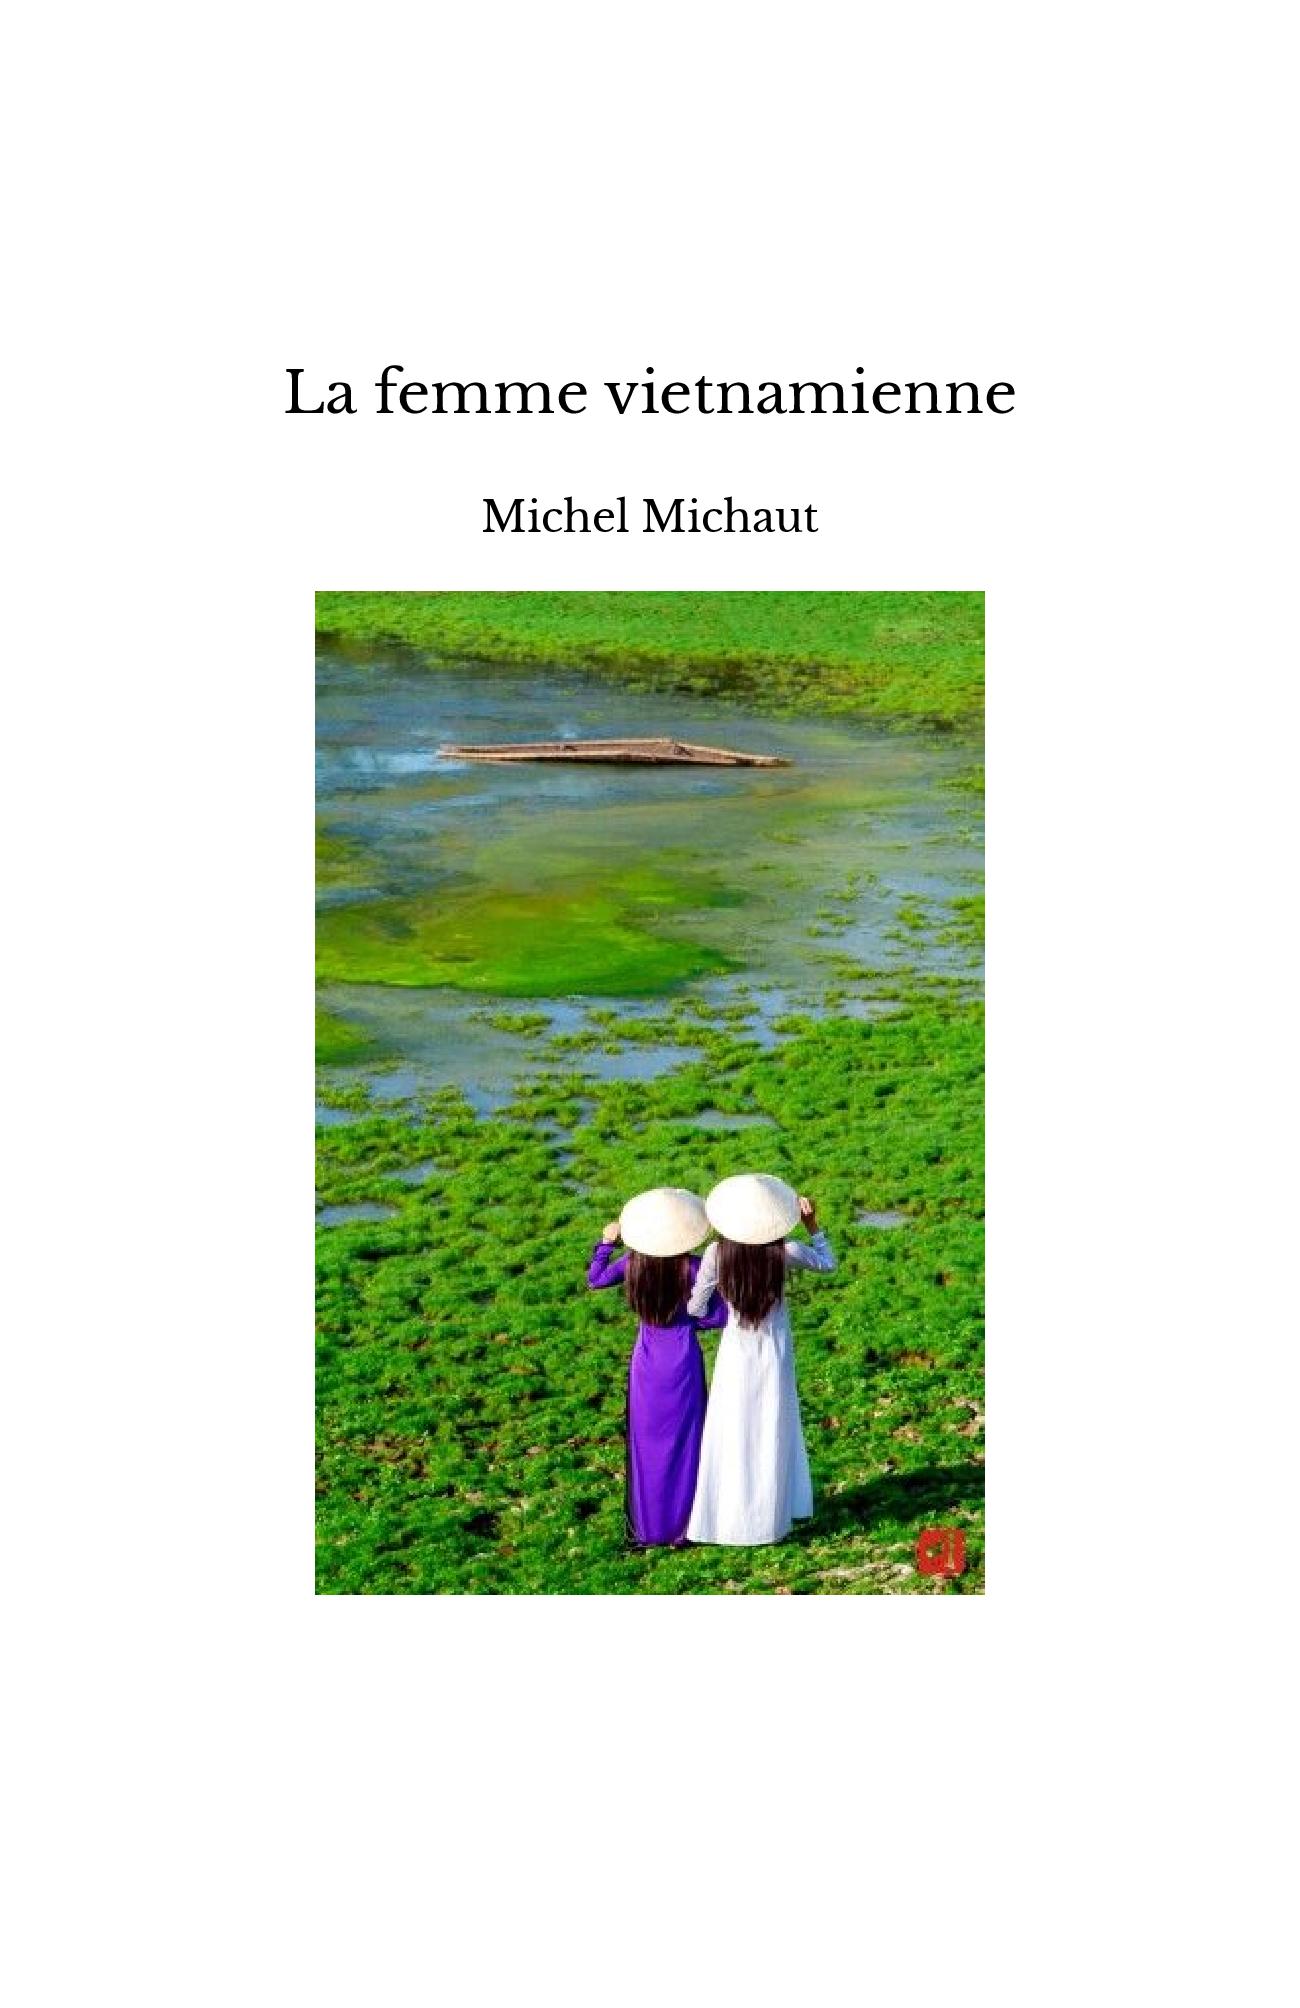 La femme vietnamienne